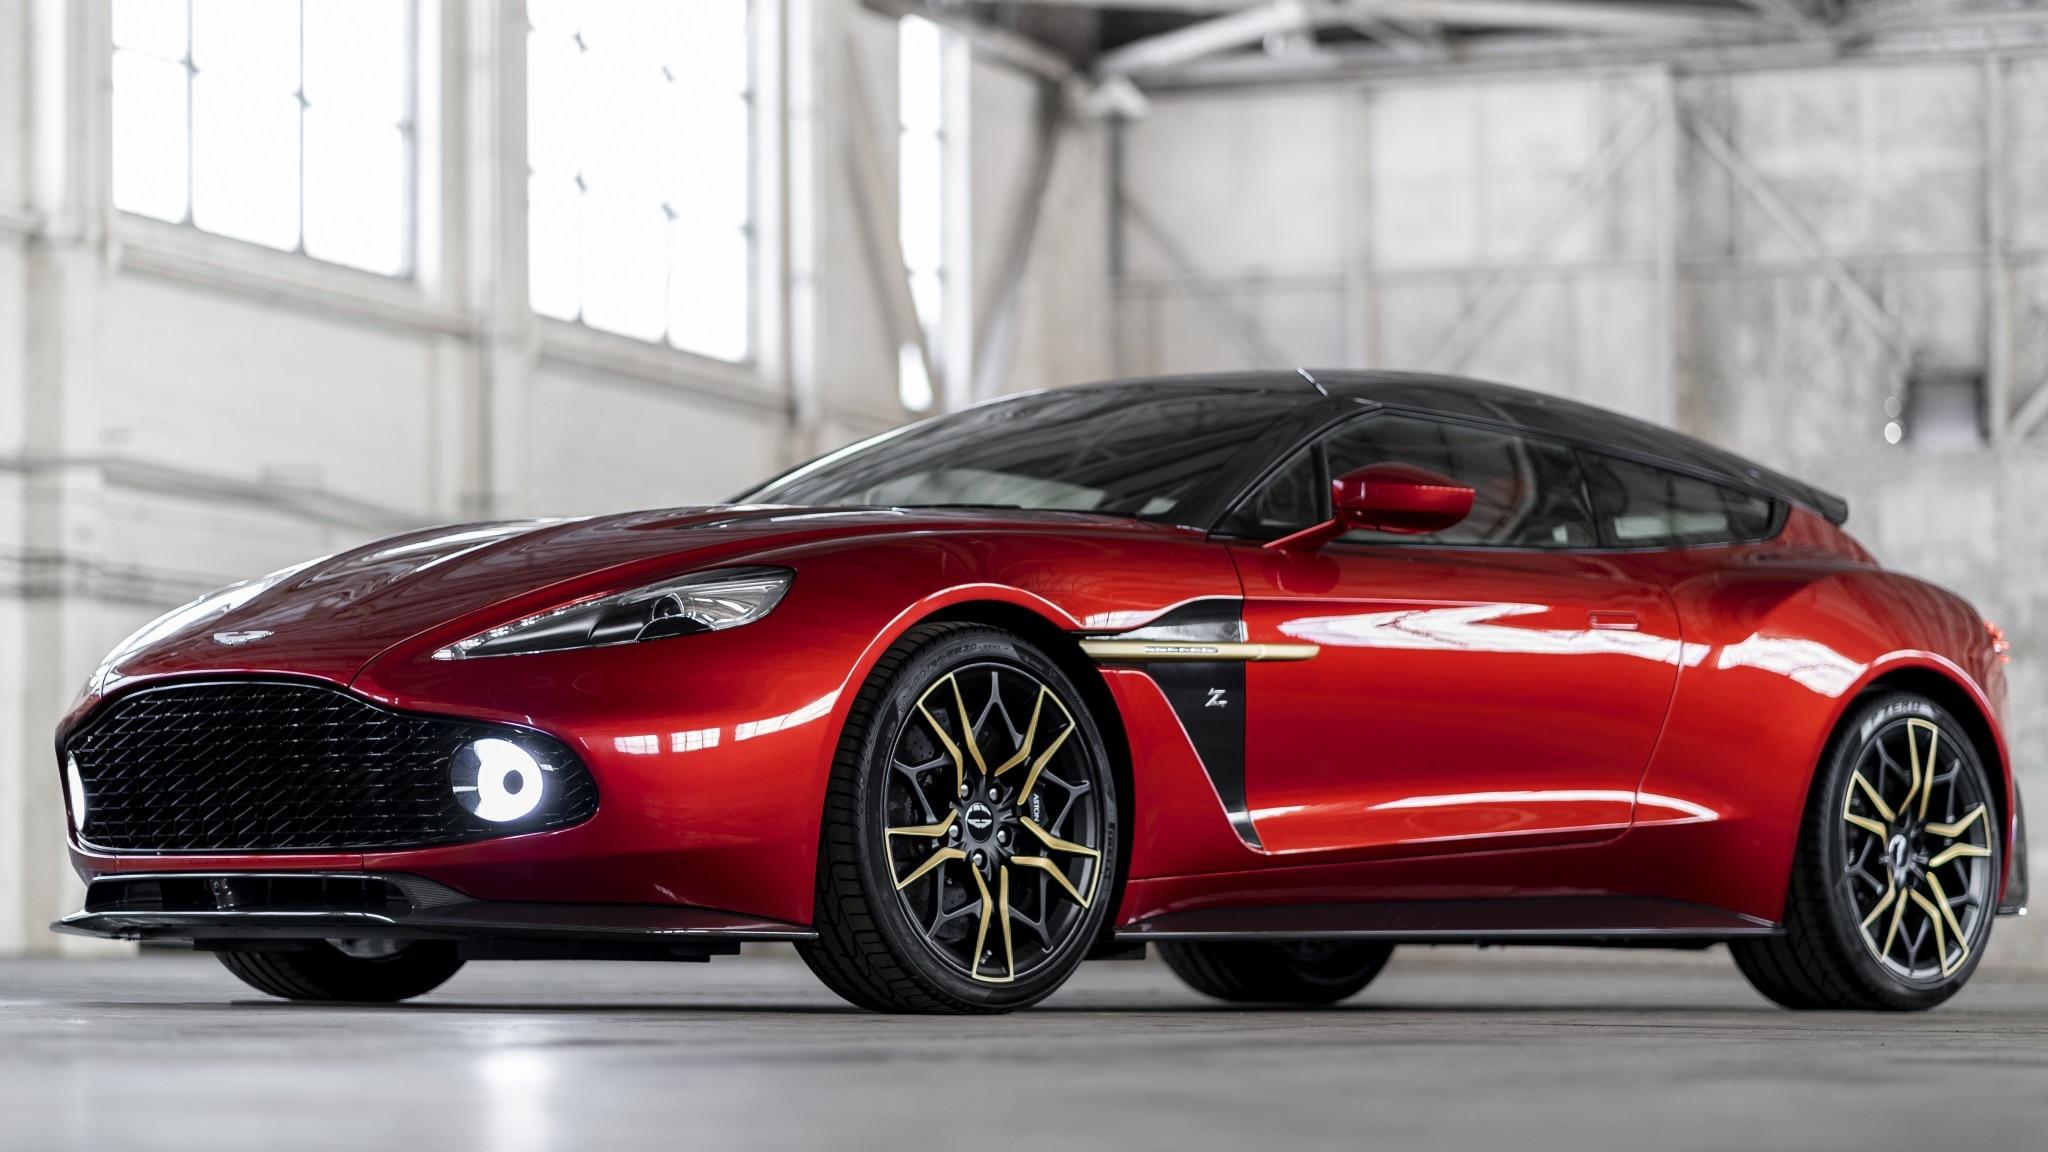 2017 Aston Martin Vanquish Zagato Shooting Brake Front Three Quarter